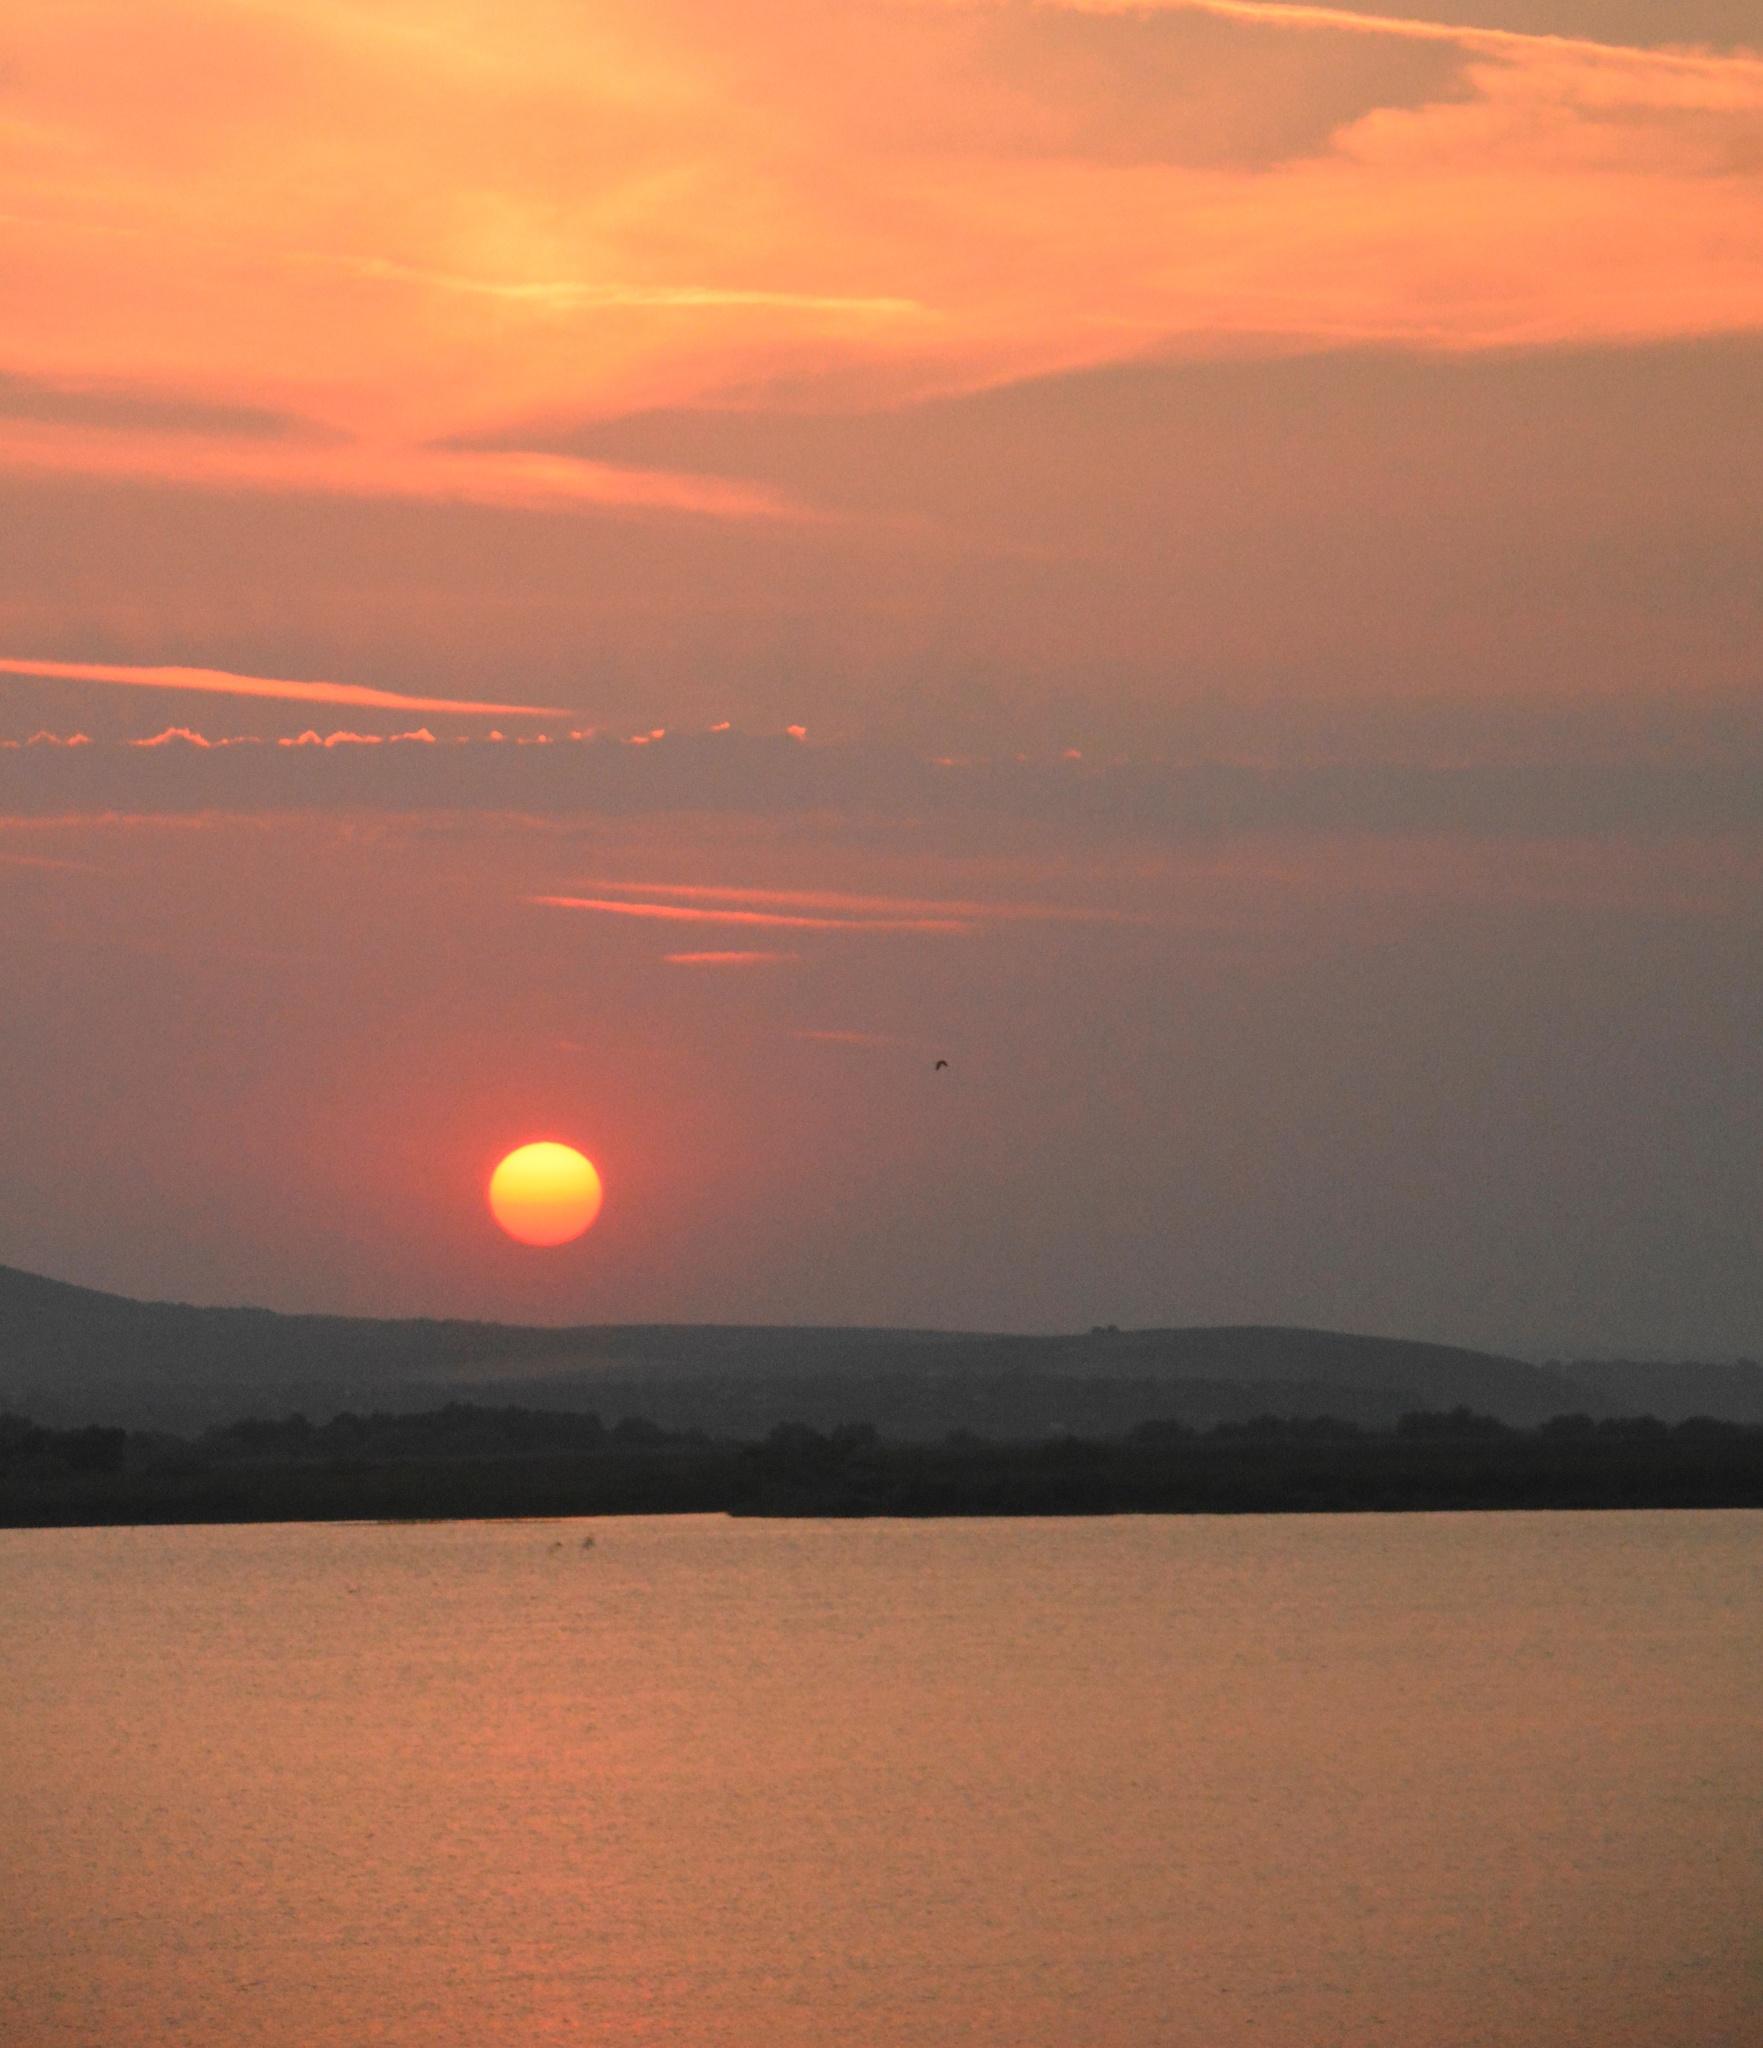 September Sunset by Bujoreanu Radu-Mihai